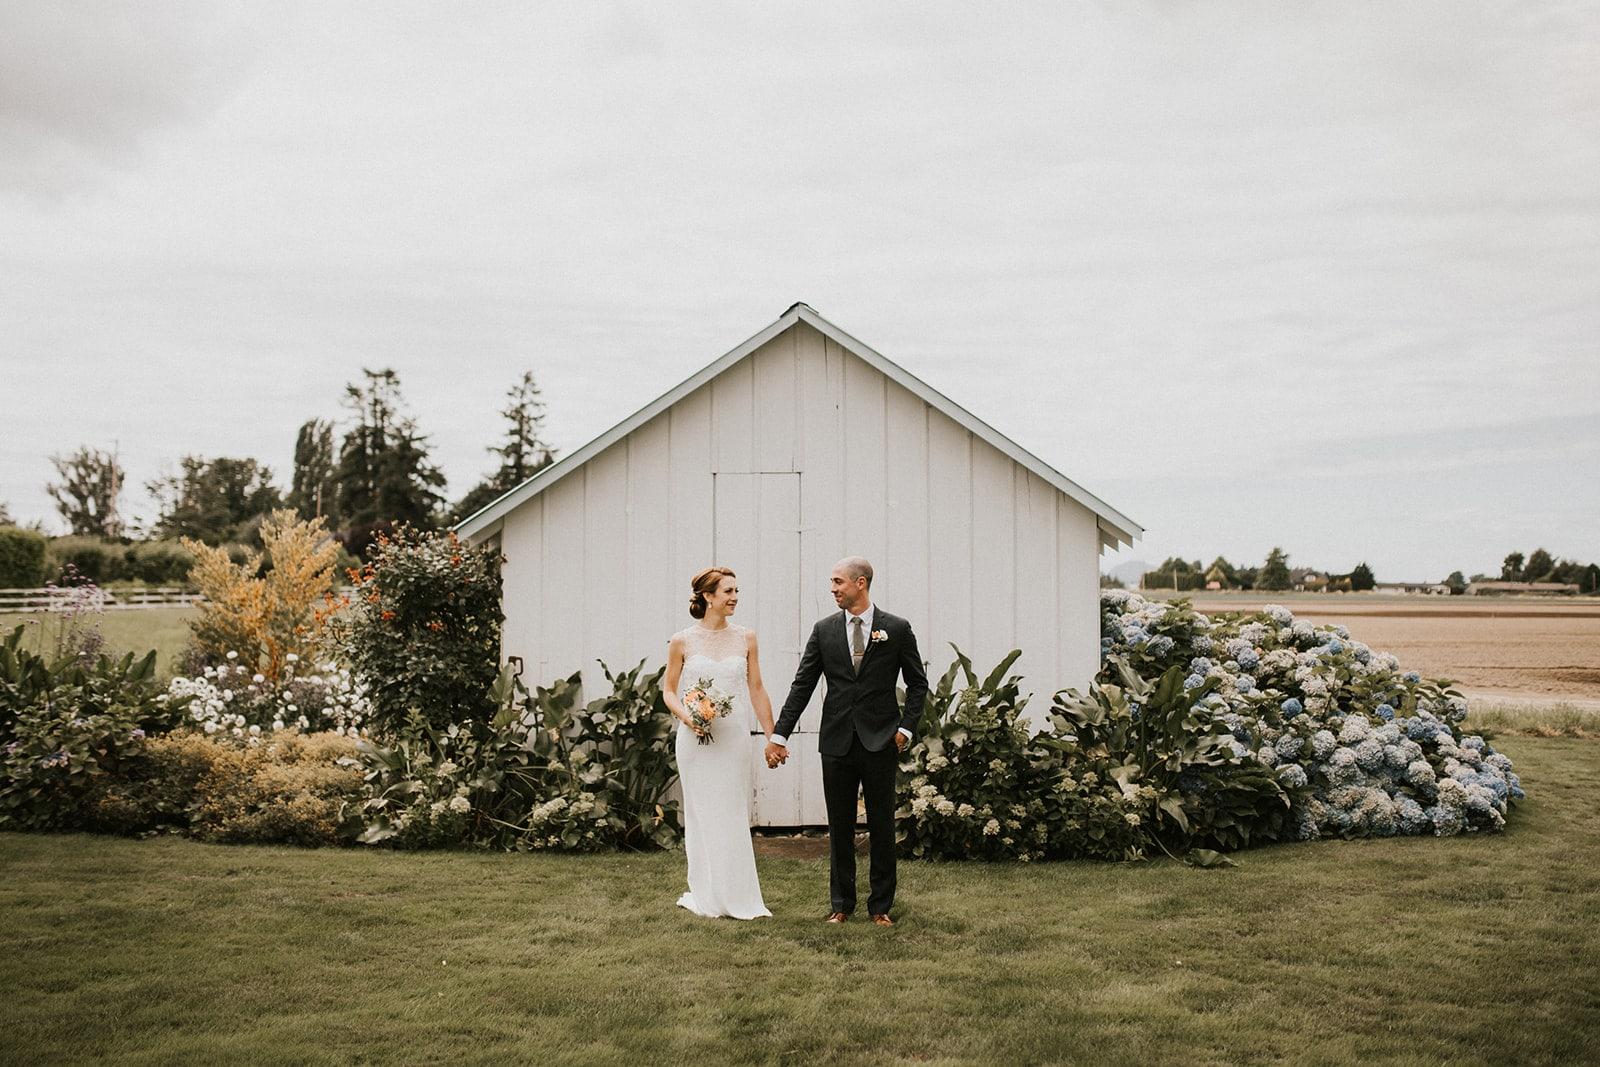 bride and groom wedding photos at Faberfarm